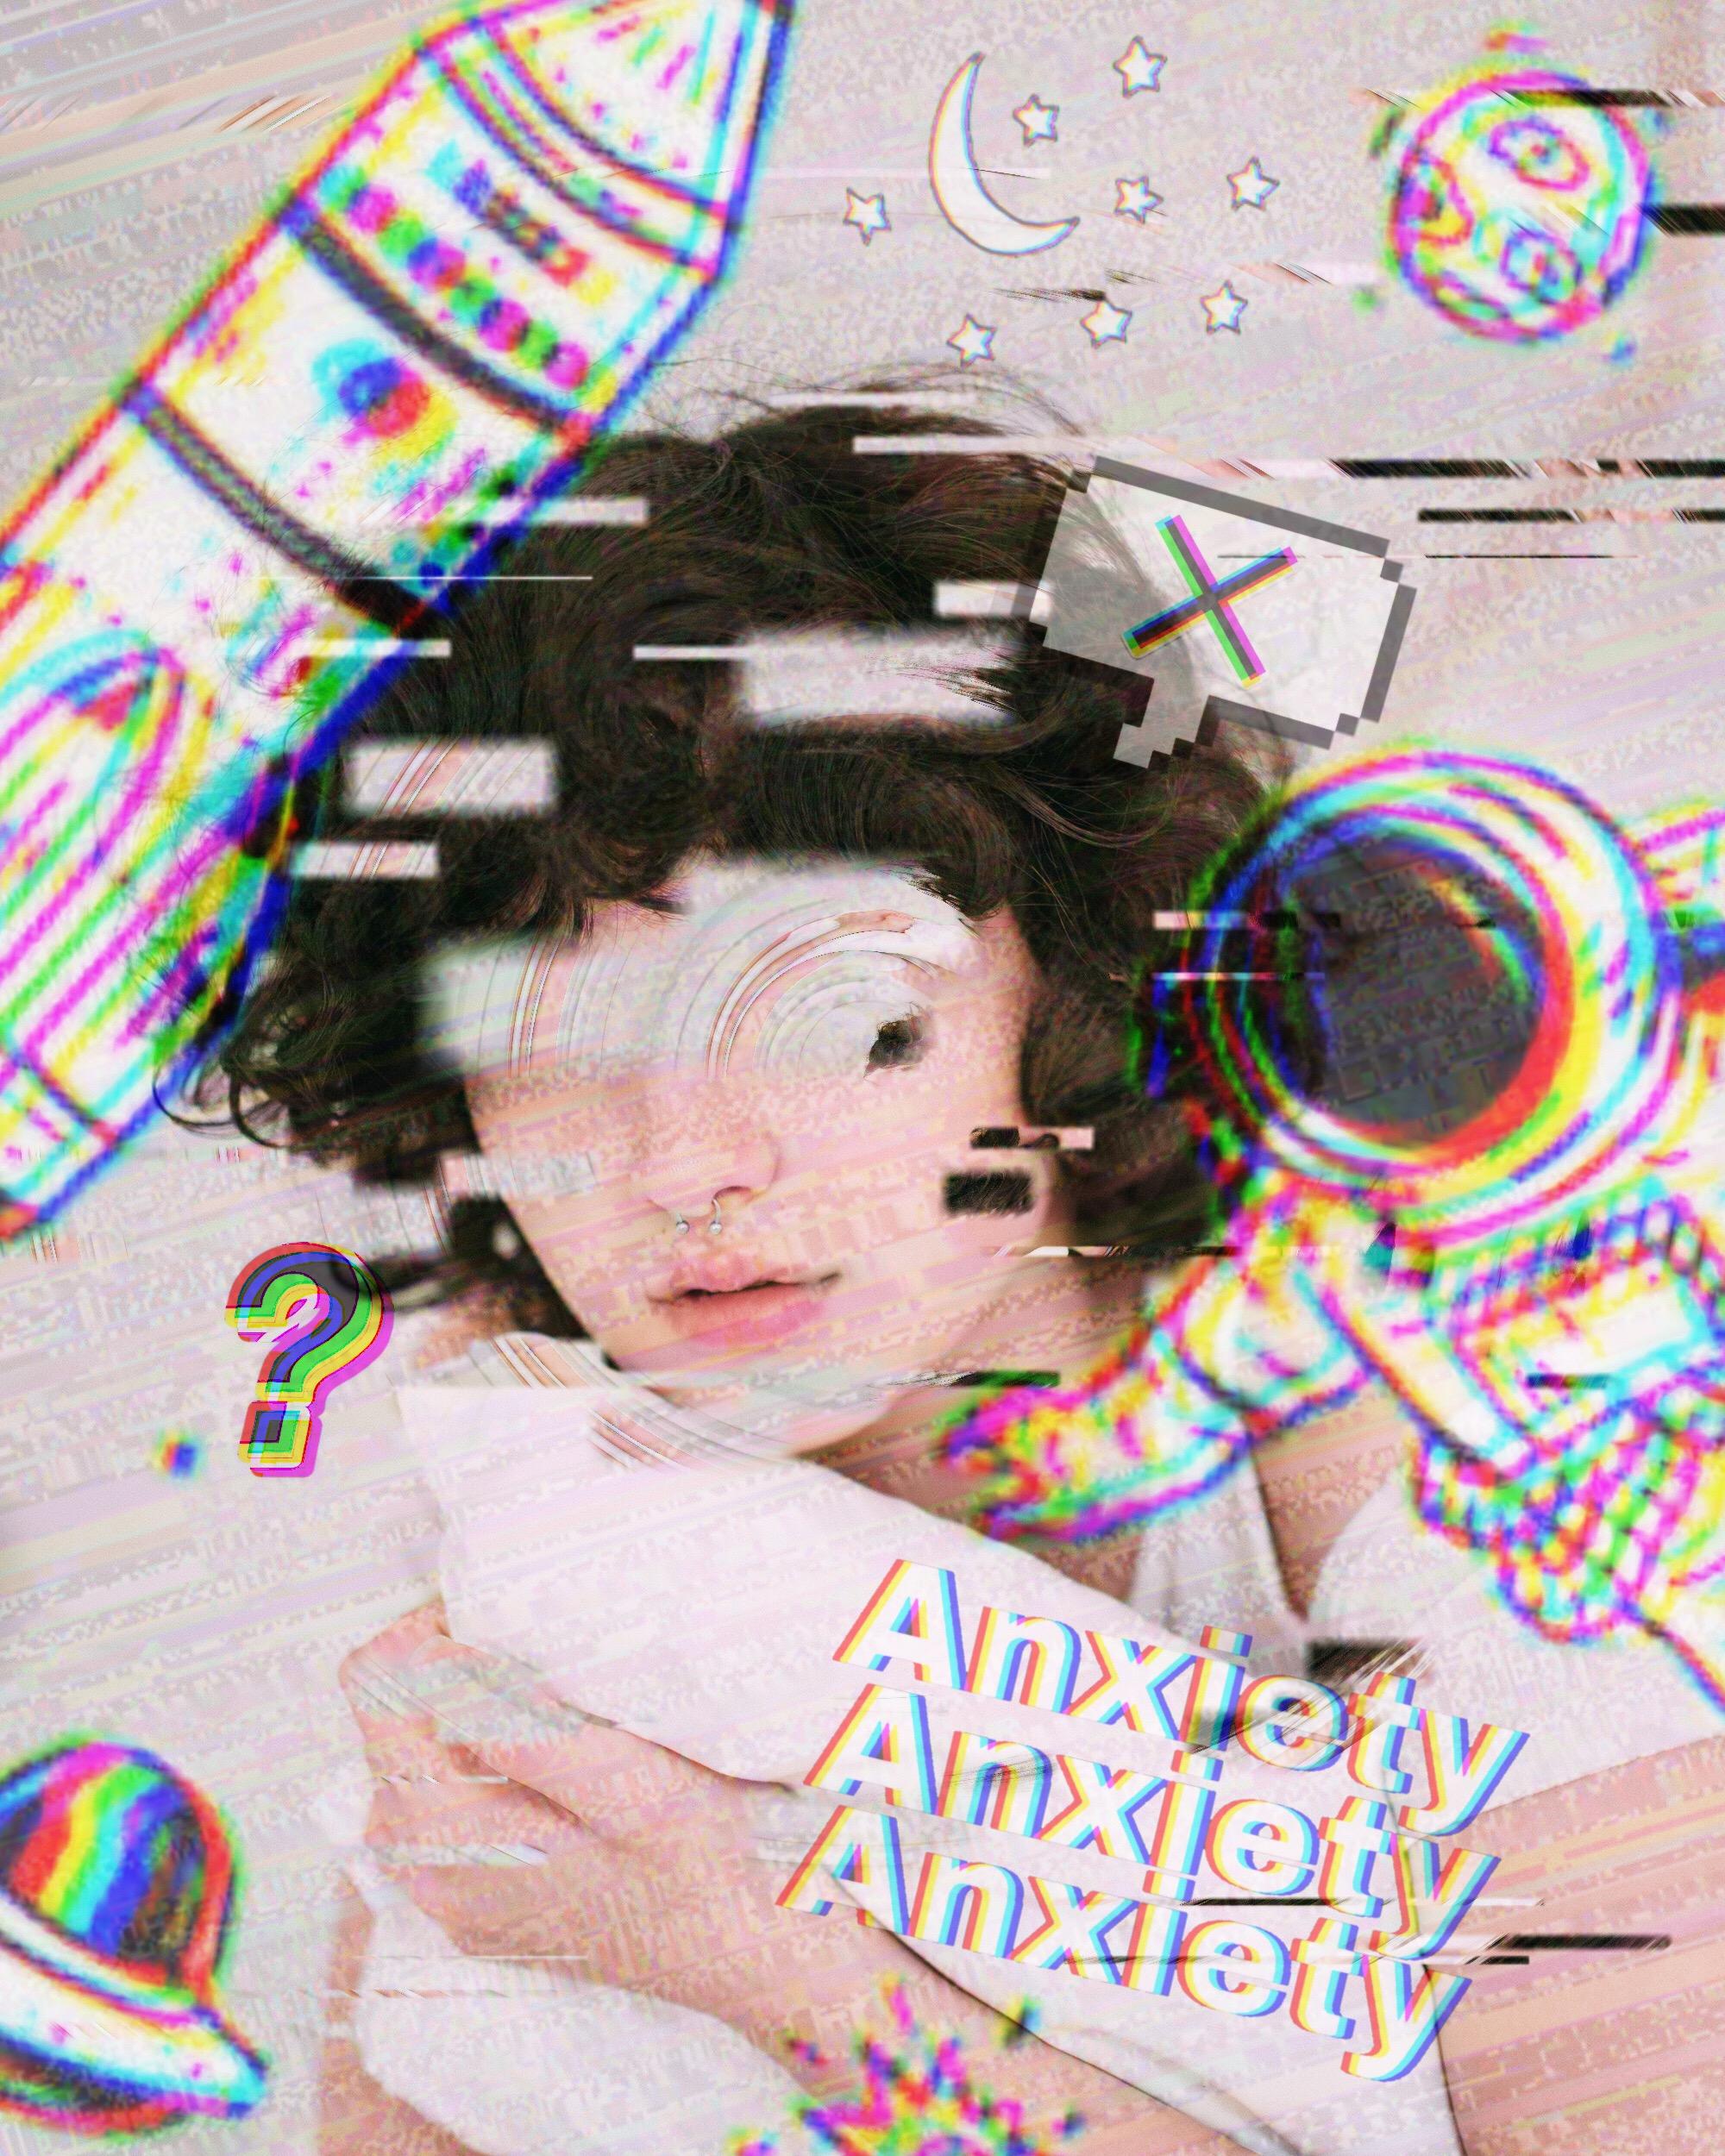 Girl Glitcheffect Image By Rebeccacuttone